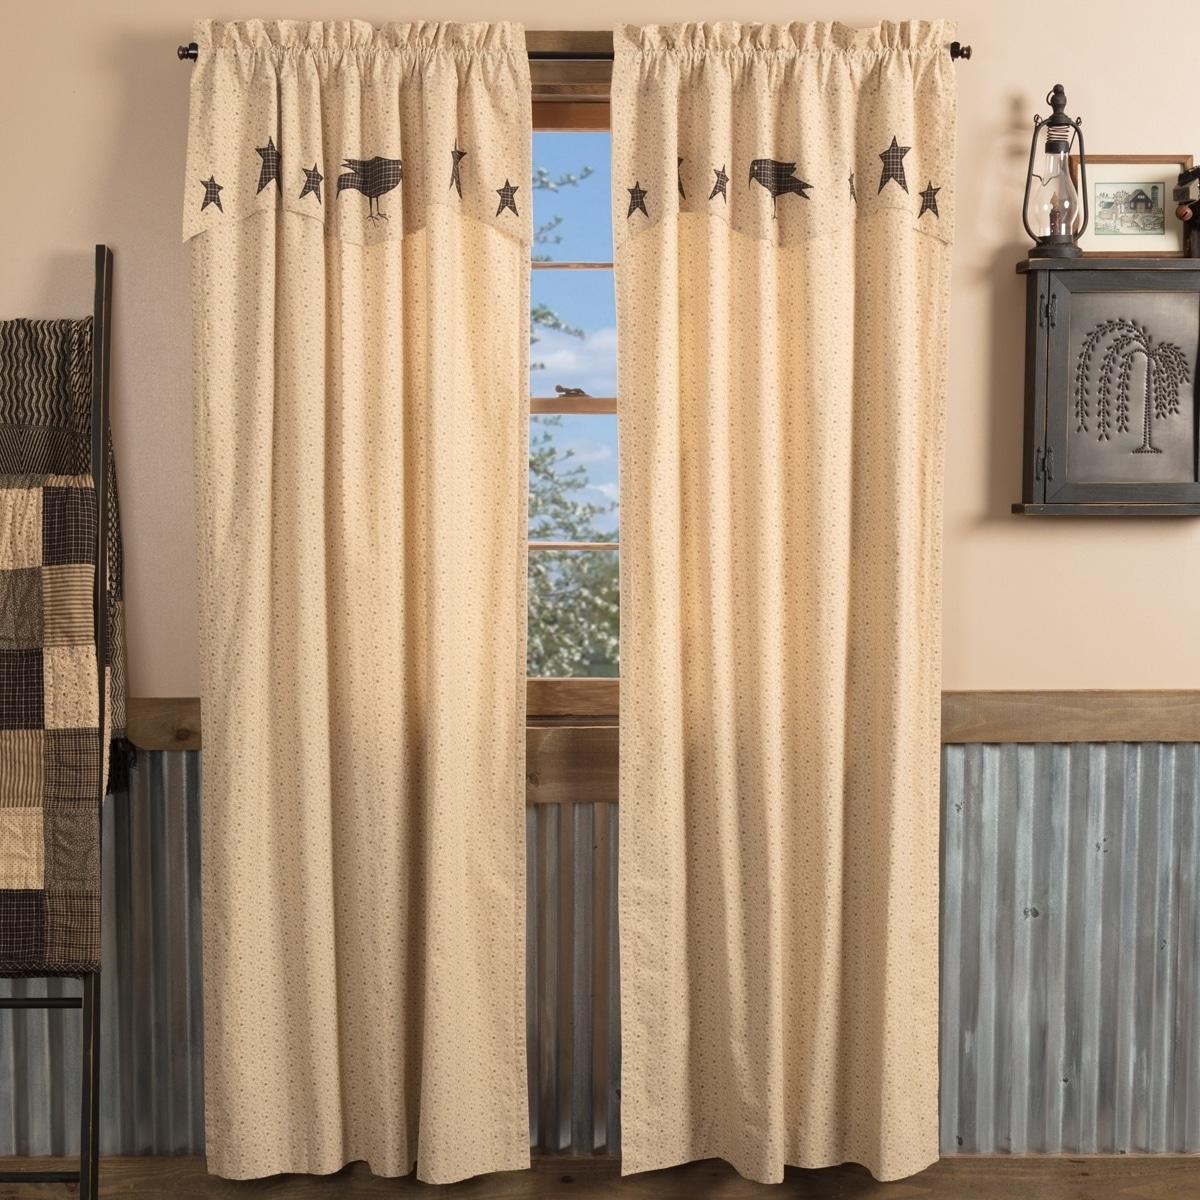 Pair Xmas window panels Swedish vintage. Two printed Christmas window panels curtains with rod pocket